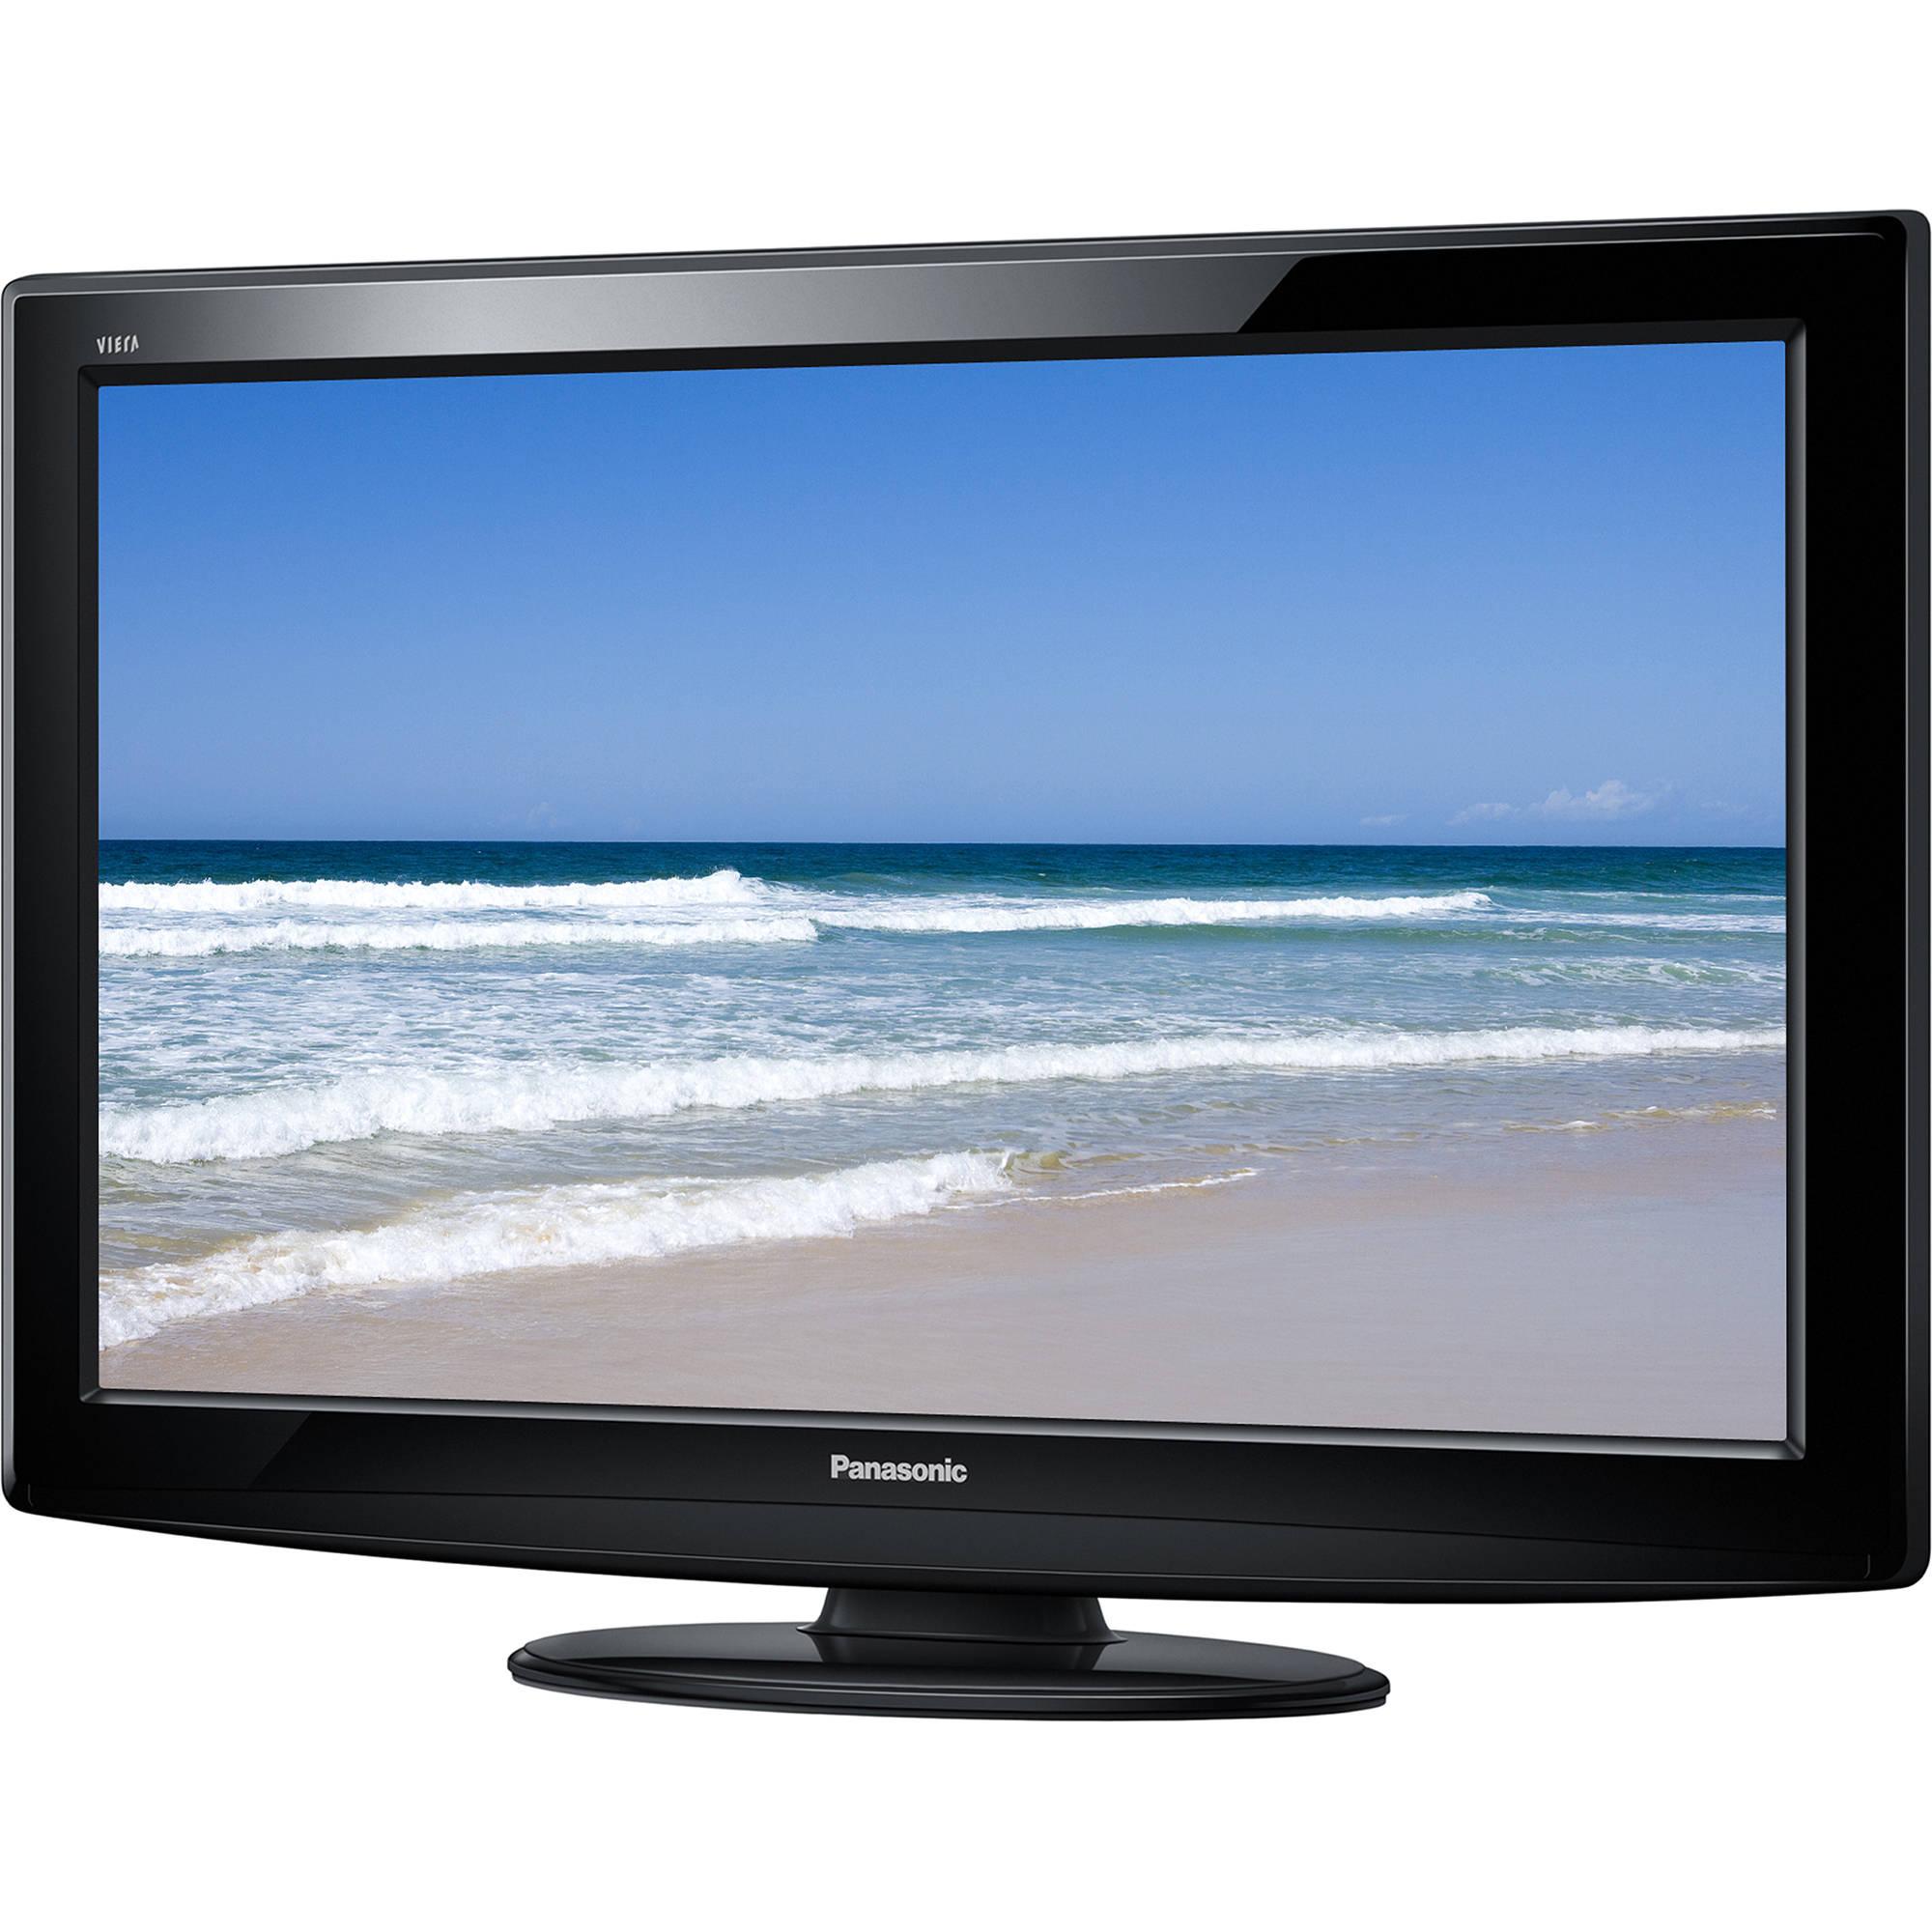 Panasonic Tc L32u22 32 Viera P Lcd Tv Tc L32u22 B Amp H